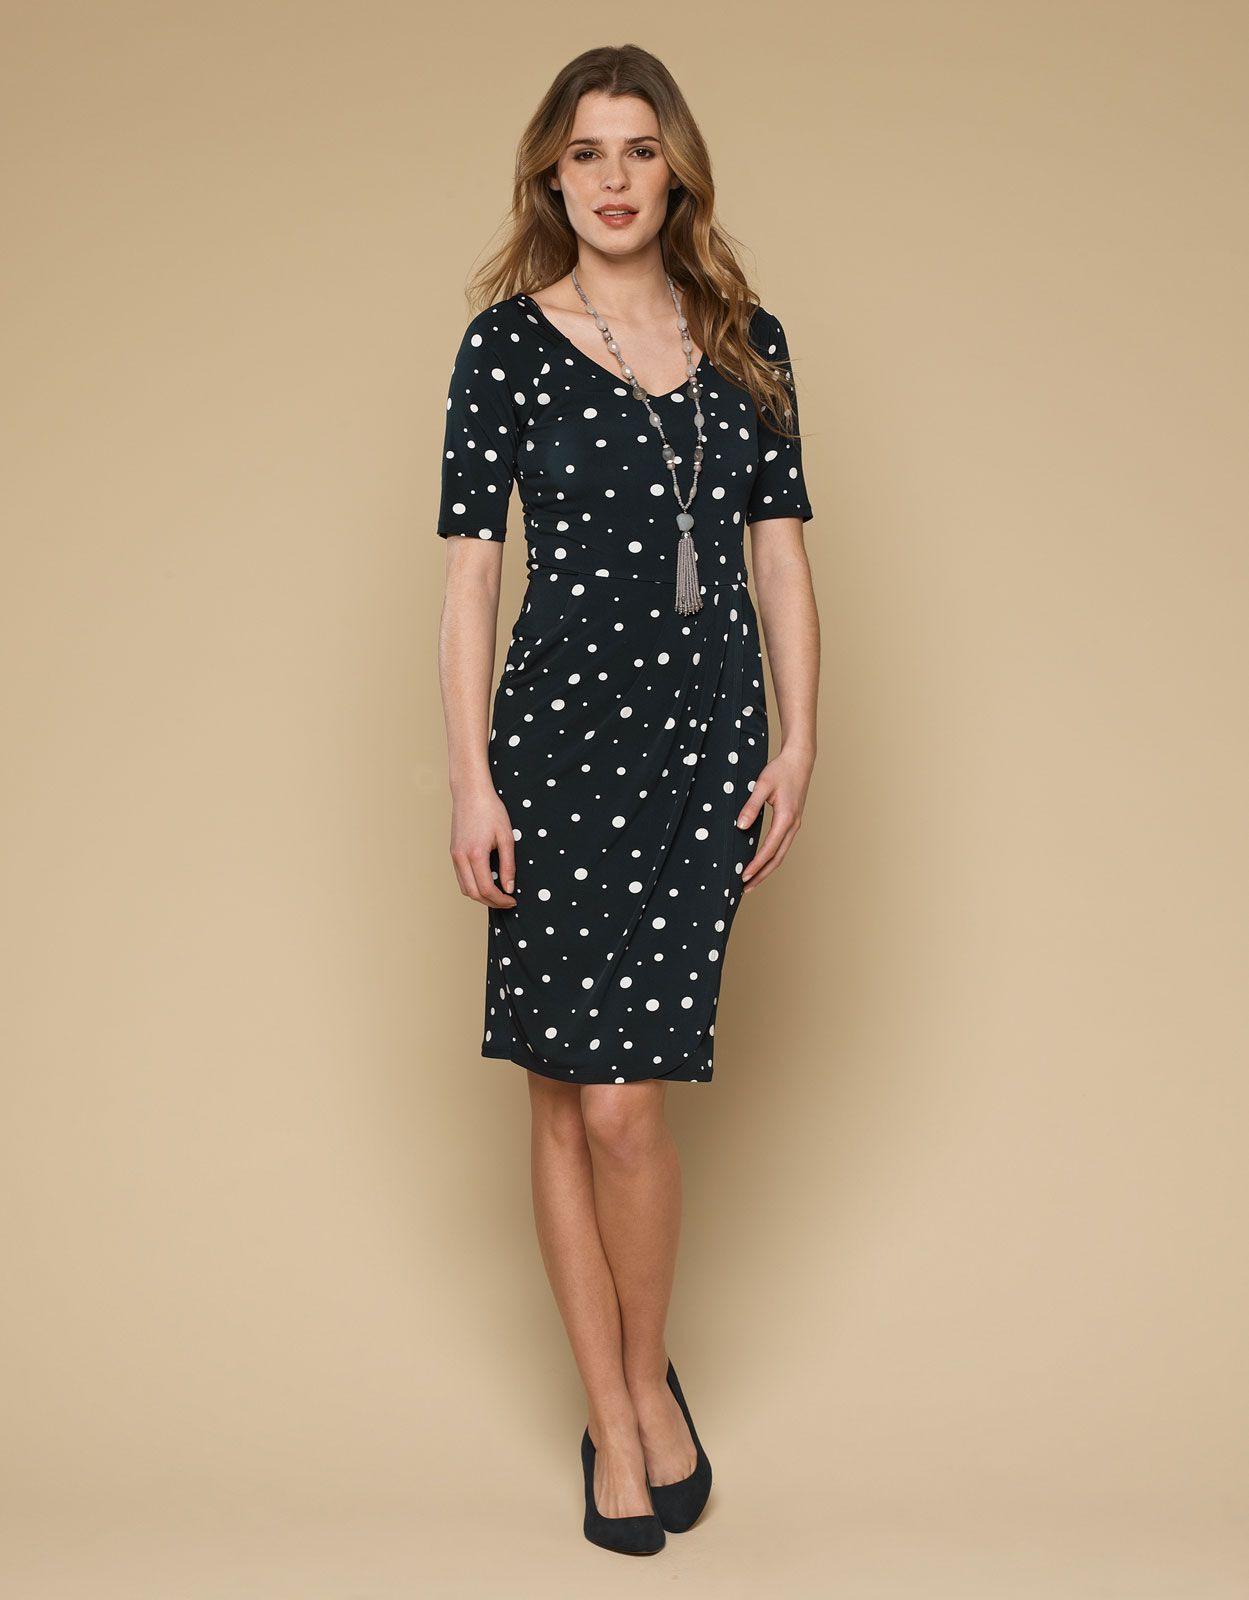 Renee Spot Shapewear Dress  Navy  Monsoon We All Want To